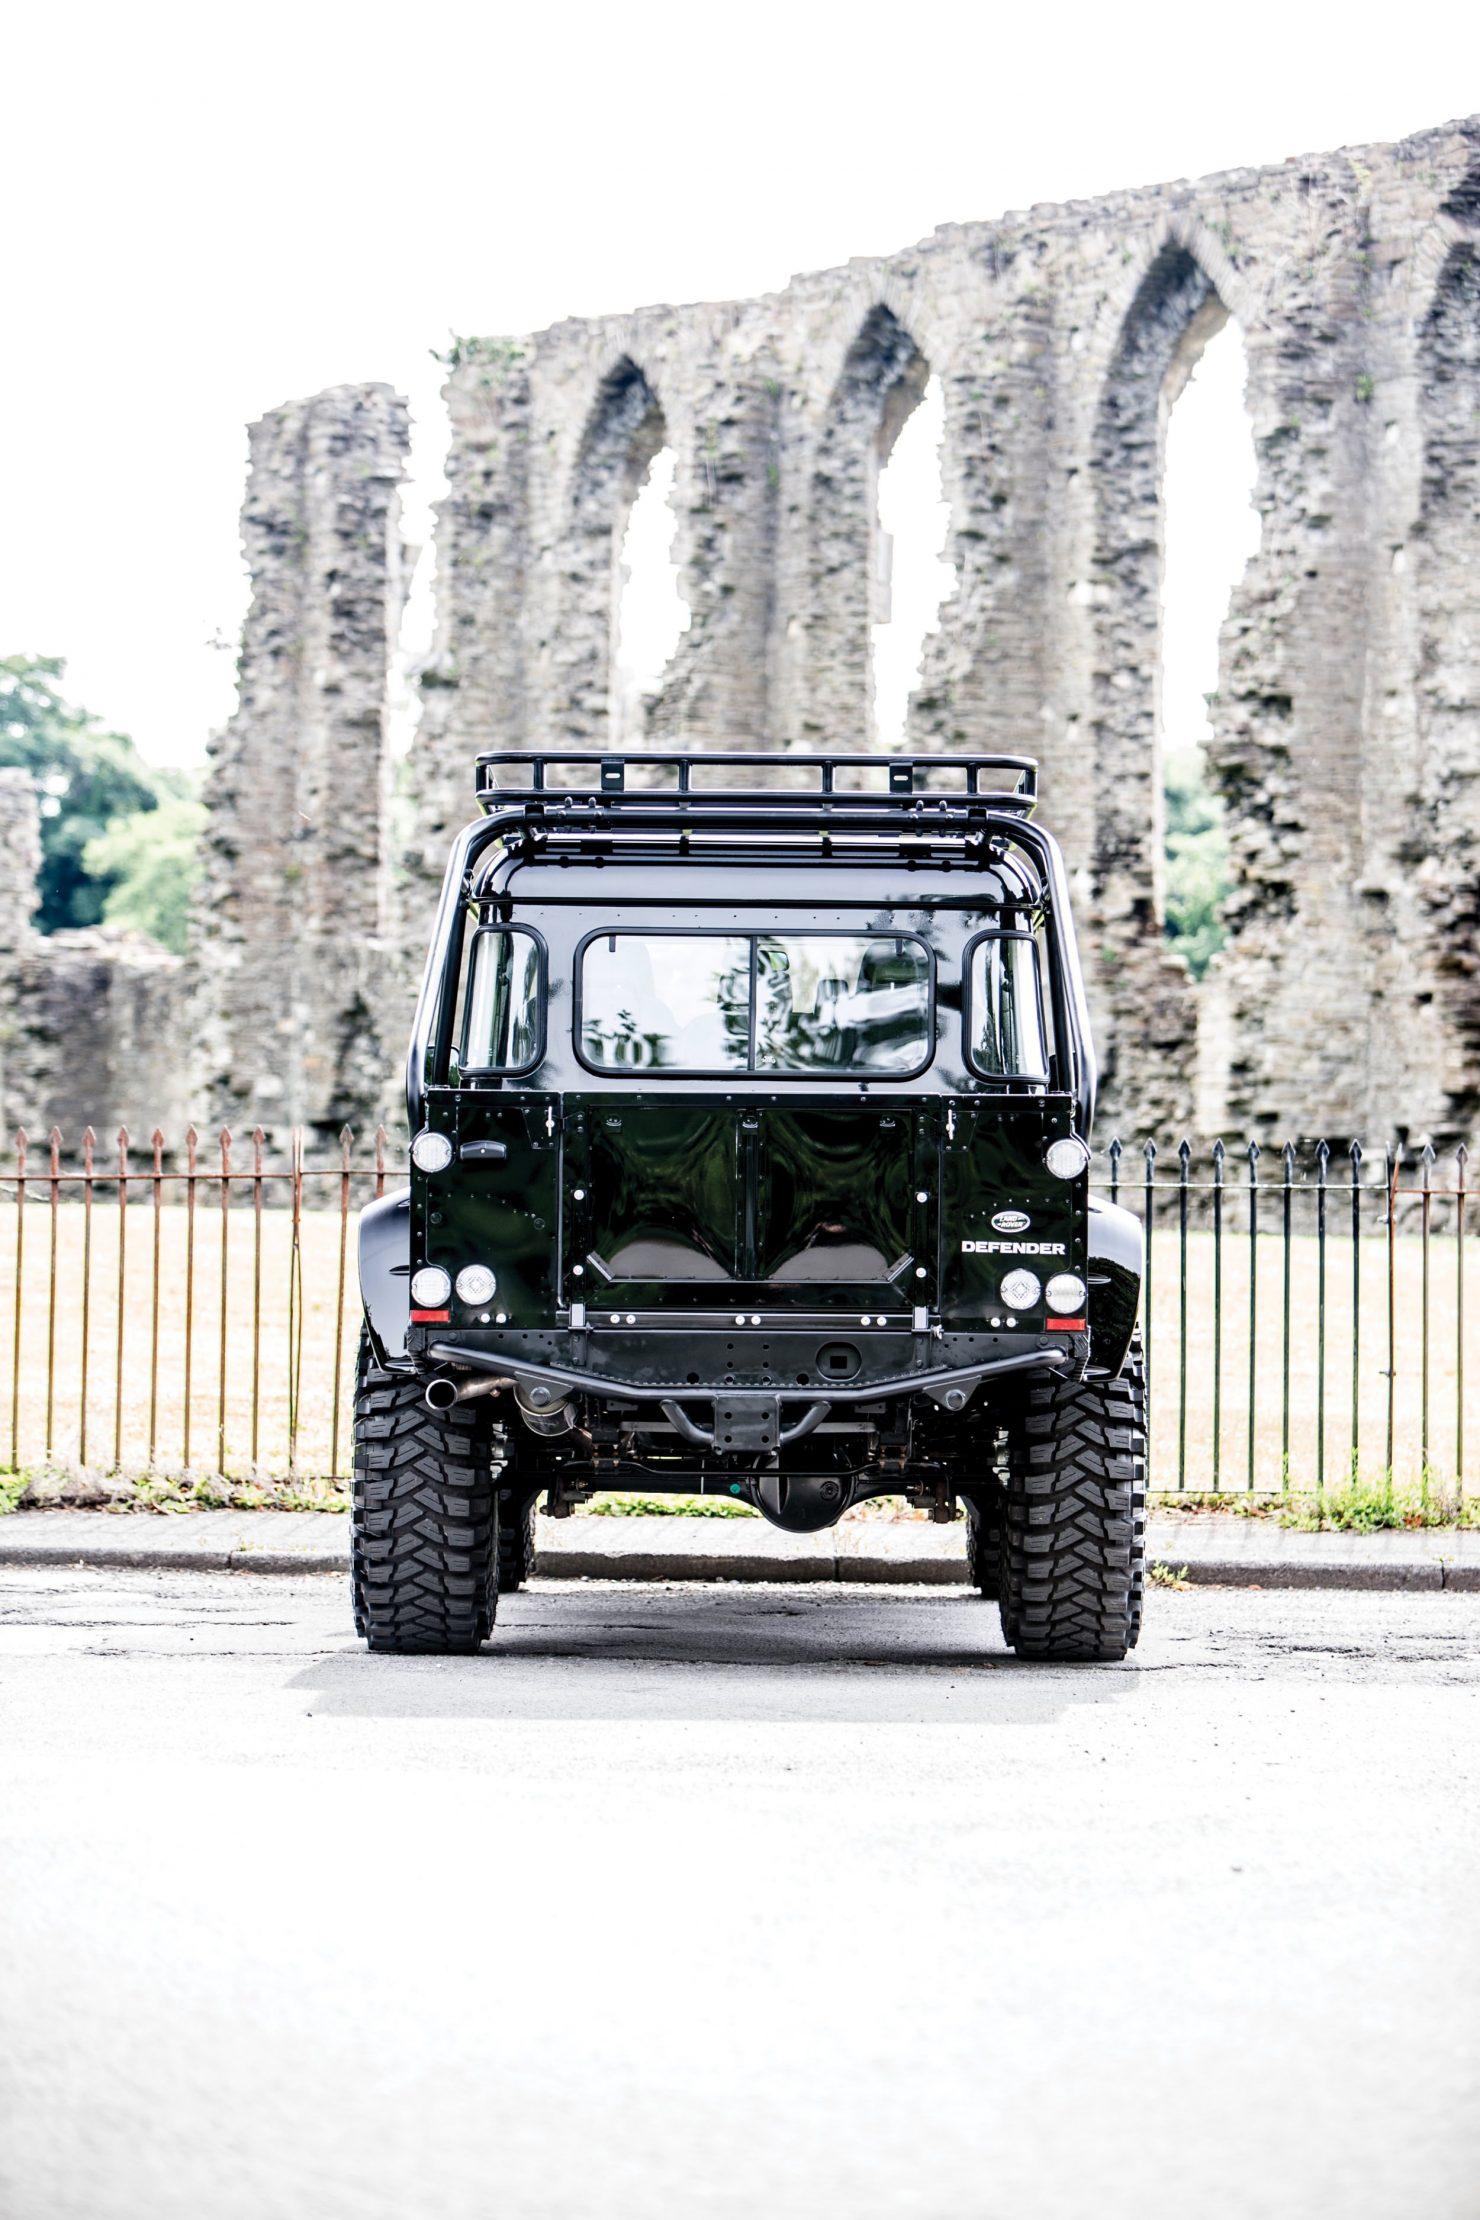 james bond spectre land rover defender svx 8 1480x2220 - Ex-James Bond Spectre - Land Rover Defender SVX